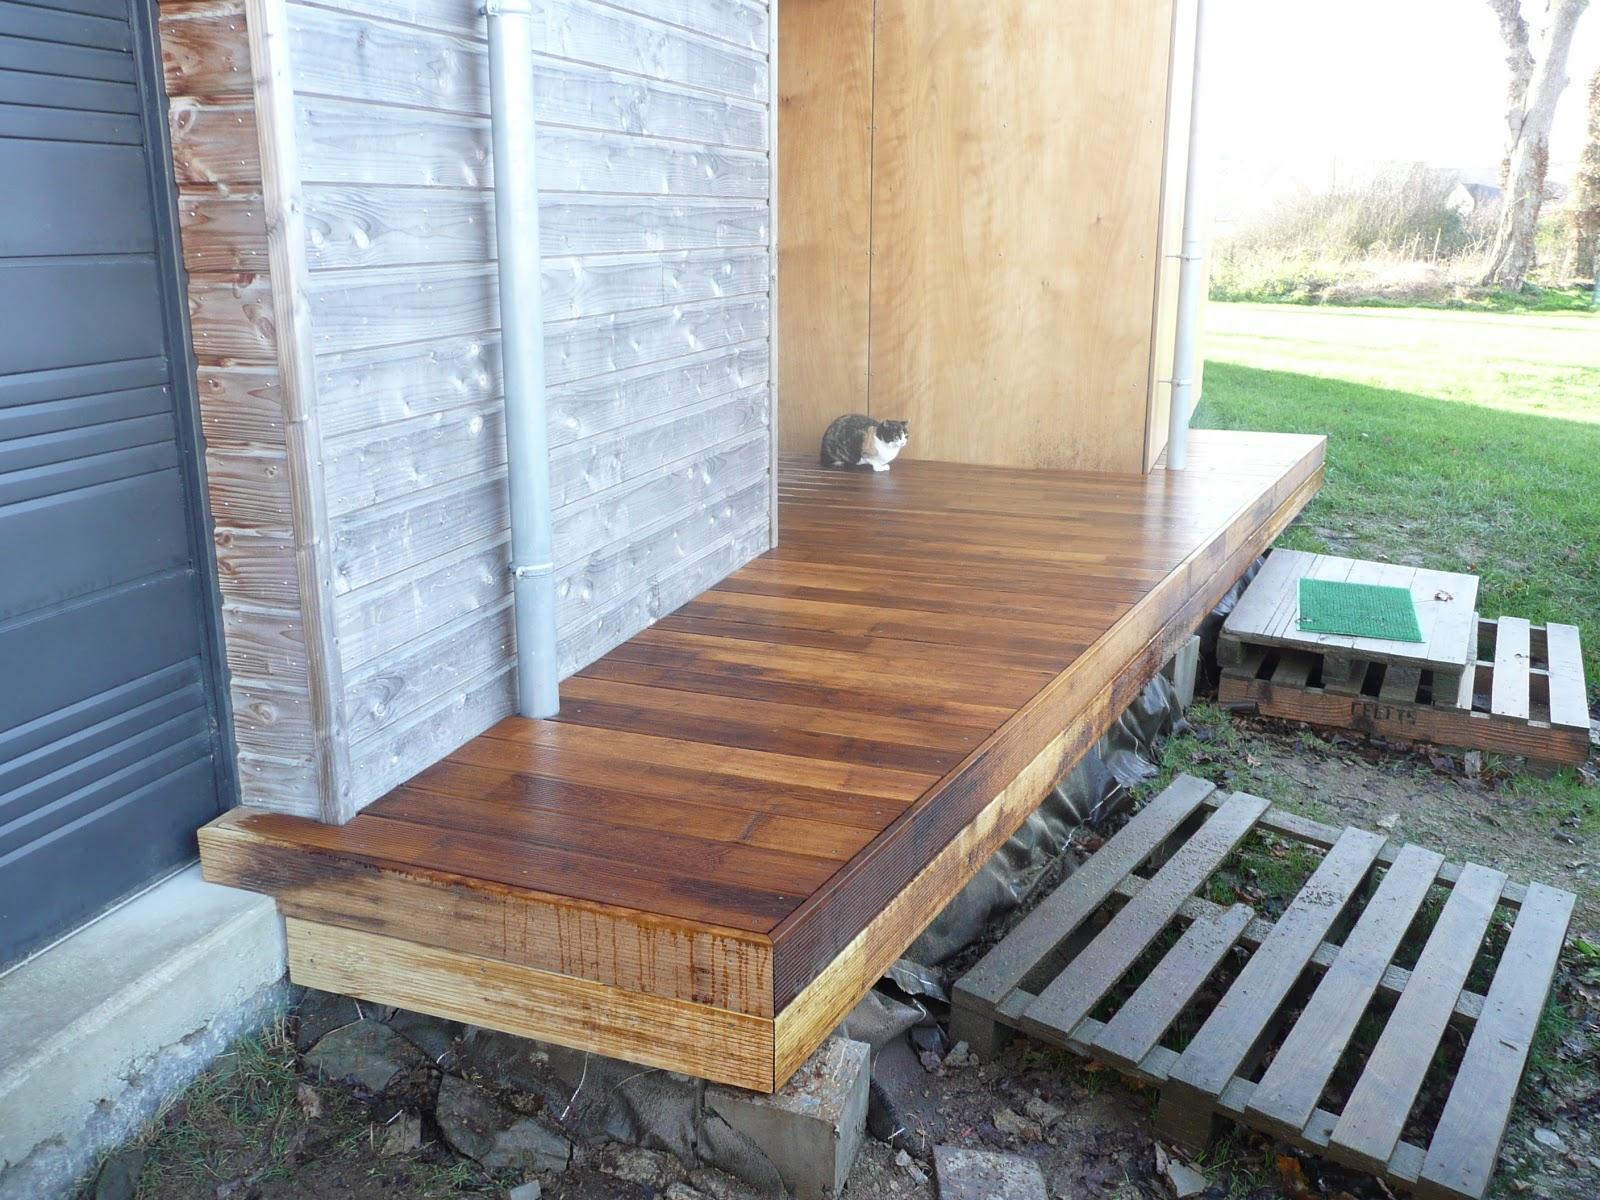 notre maison en bois terrasse bois entr e. Black Bedroom Furniture Sets. Home Design Ideas